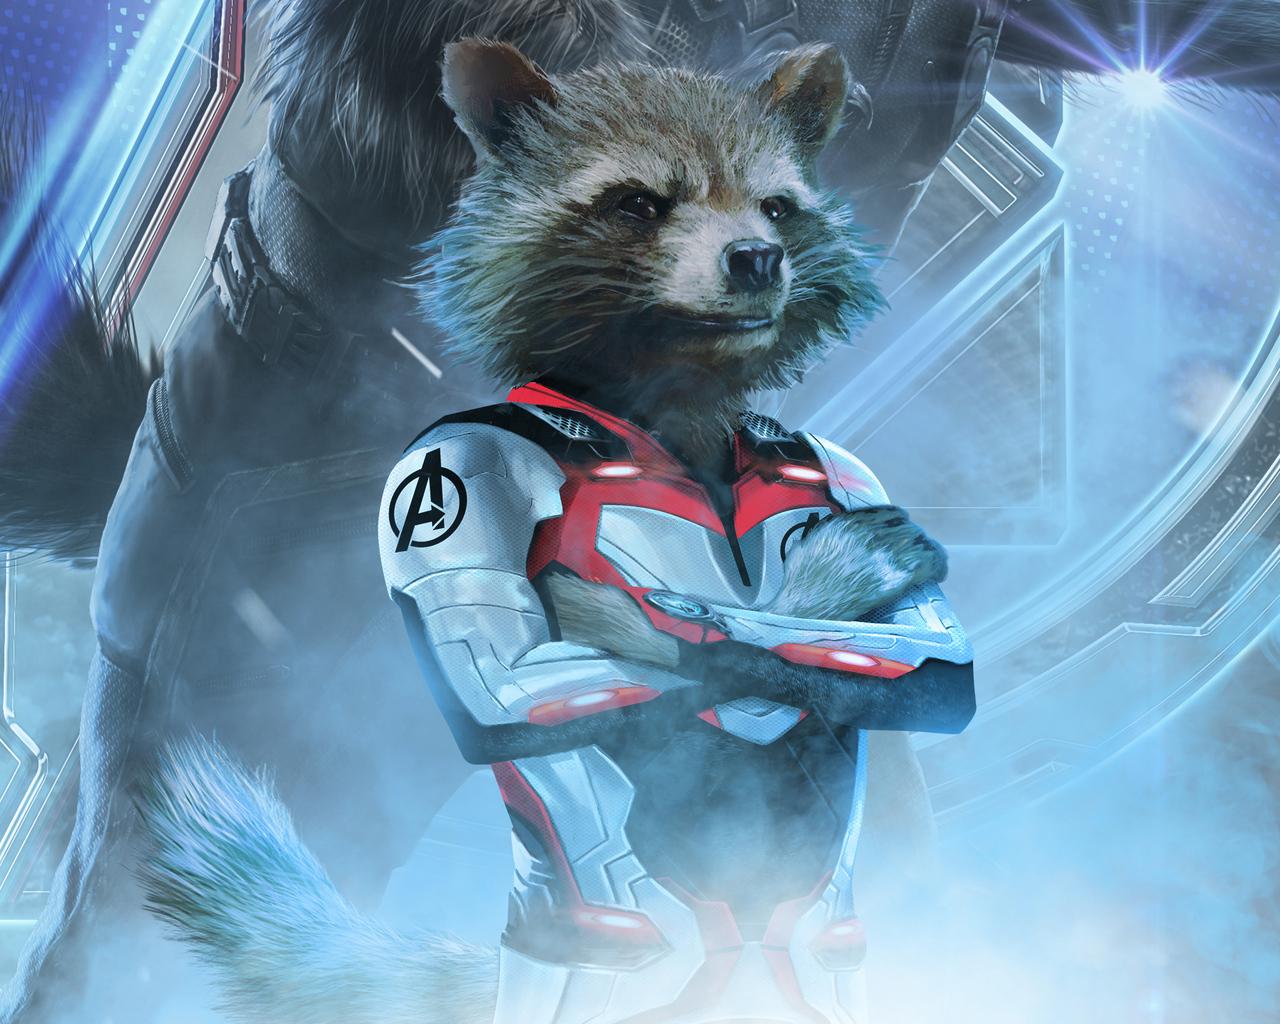 1280x1024 rocket raccoon in avengers endgame 2019 - Rocket raccoon phone wallpaper ...